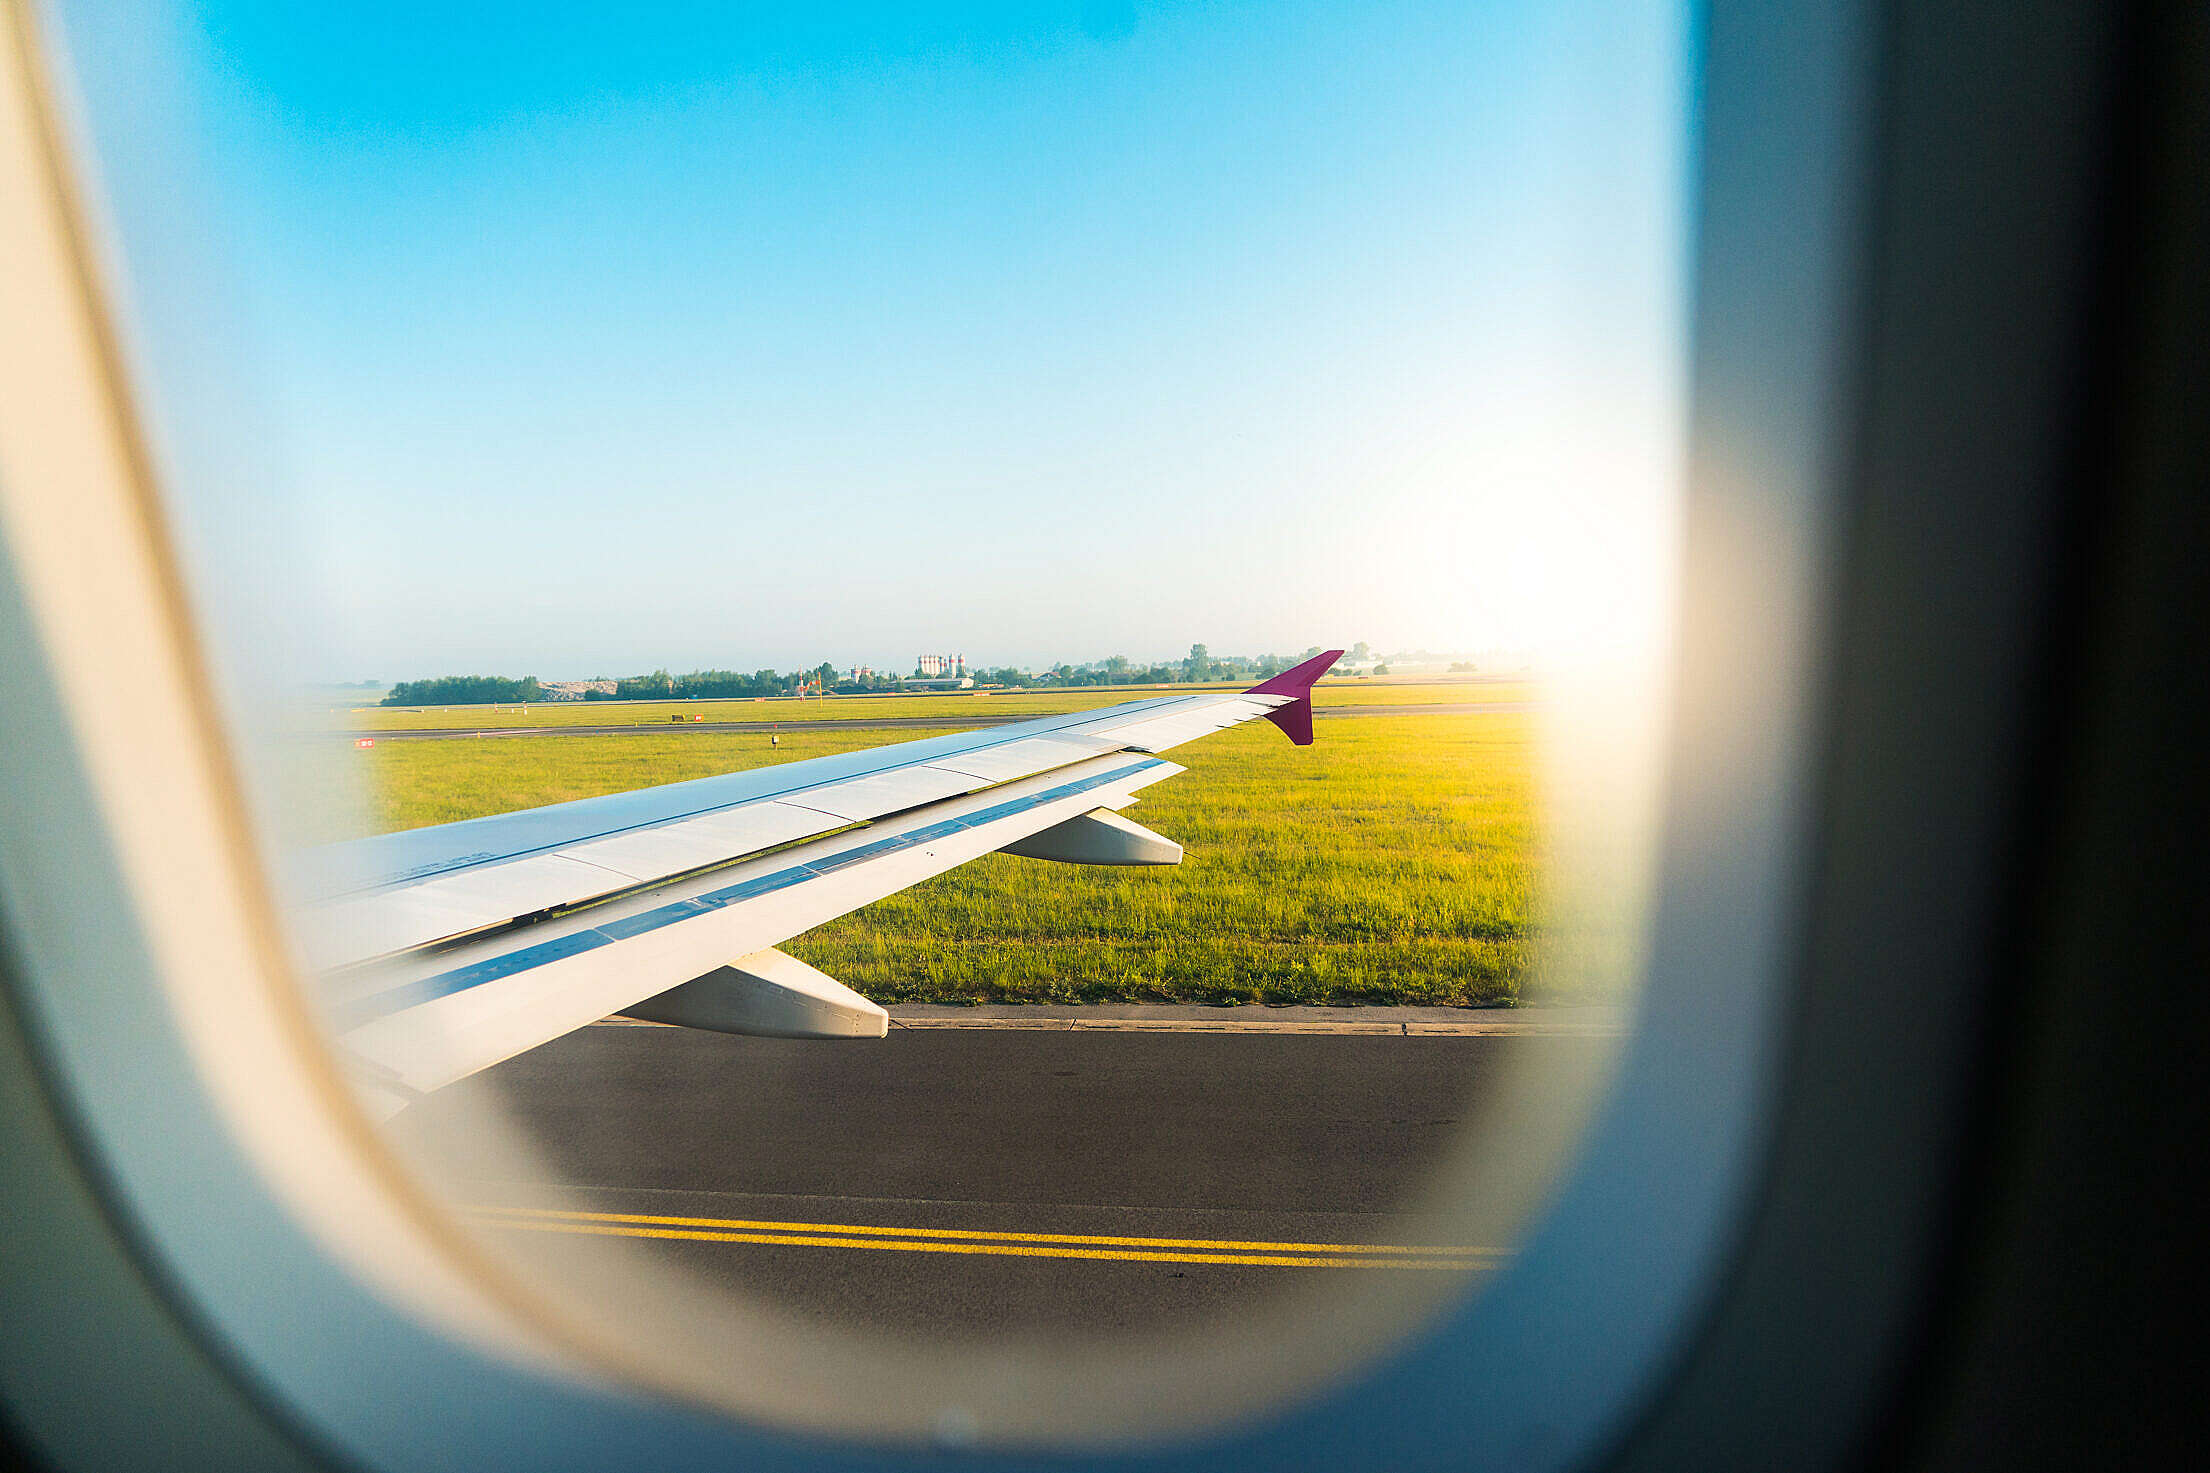 Airplane Wing Through Window During Take Off Free Stock Photo